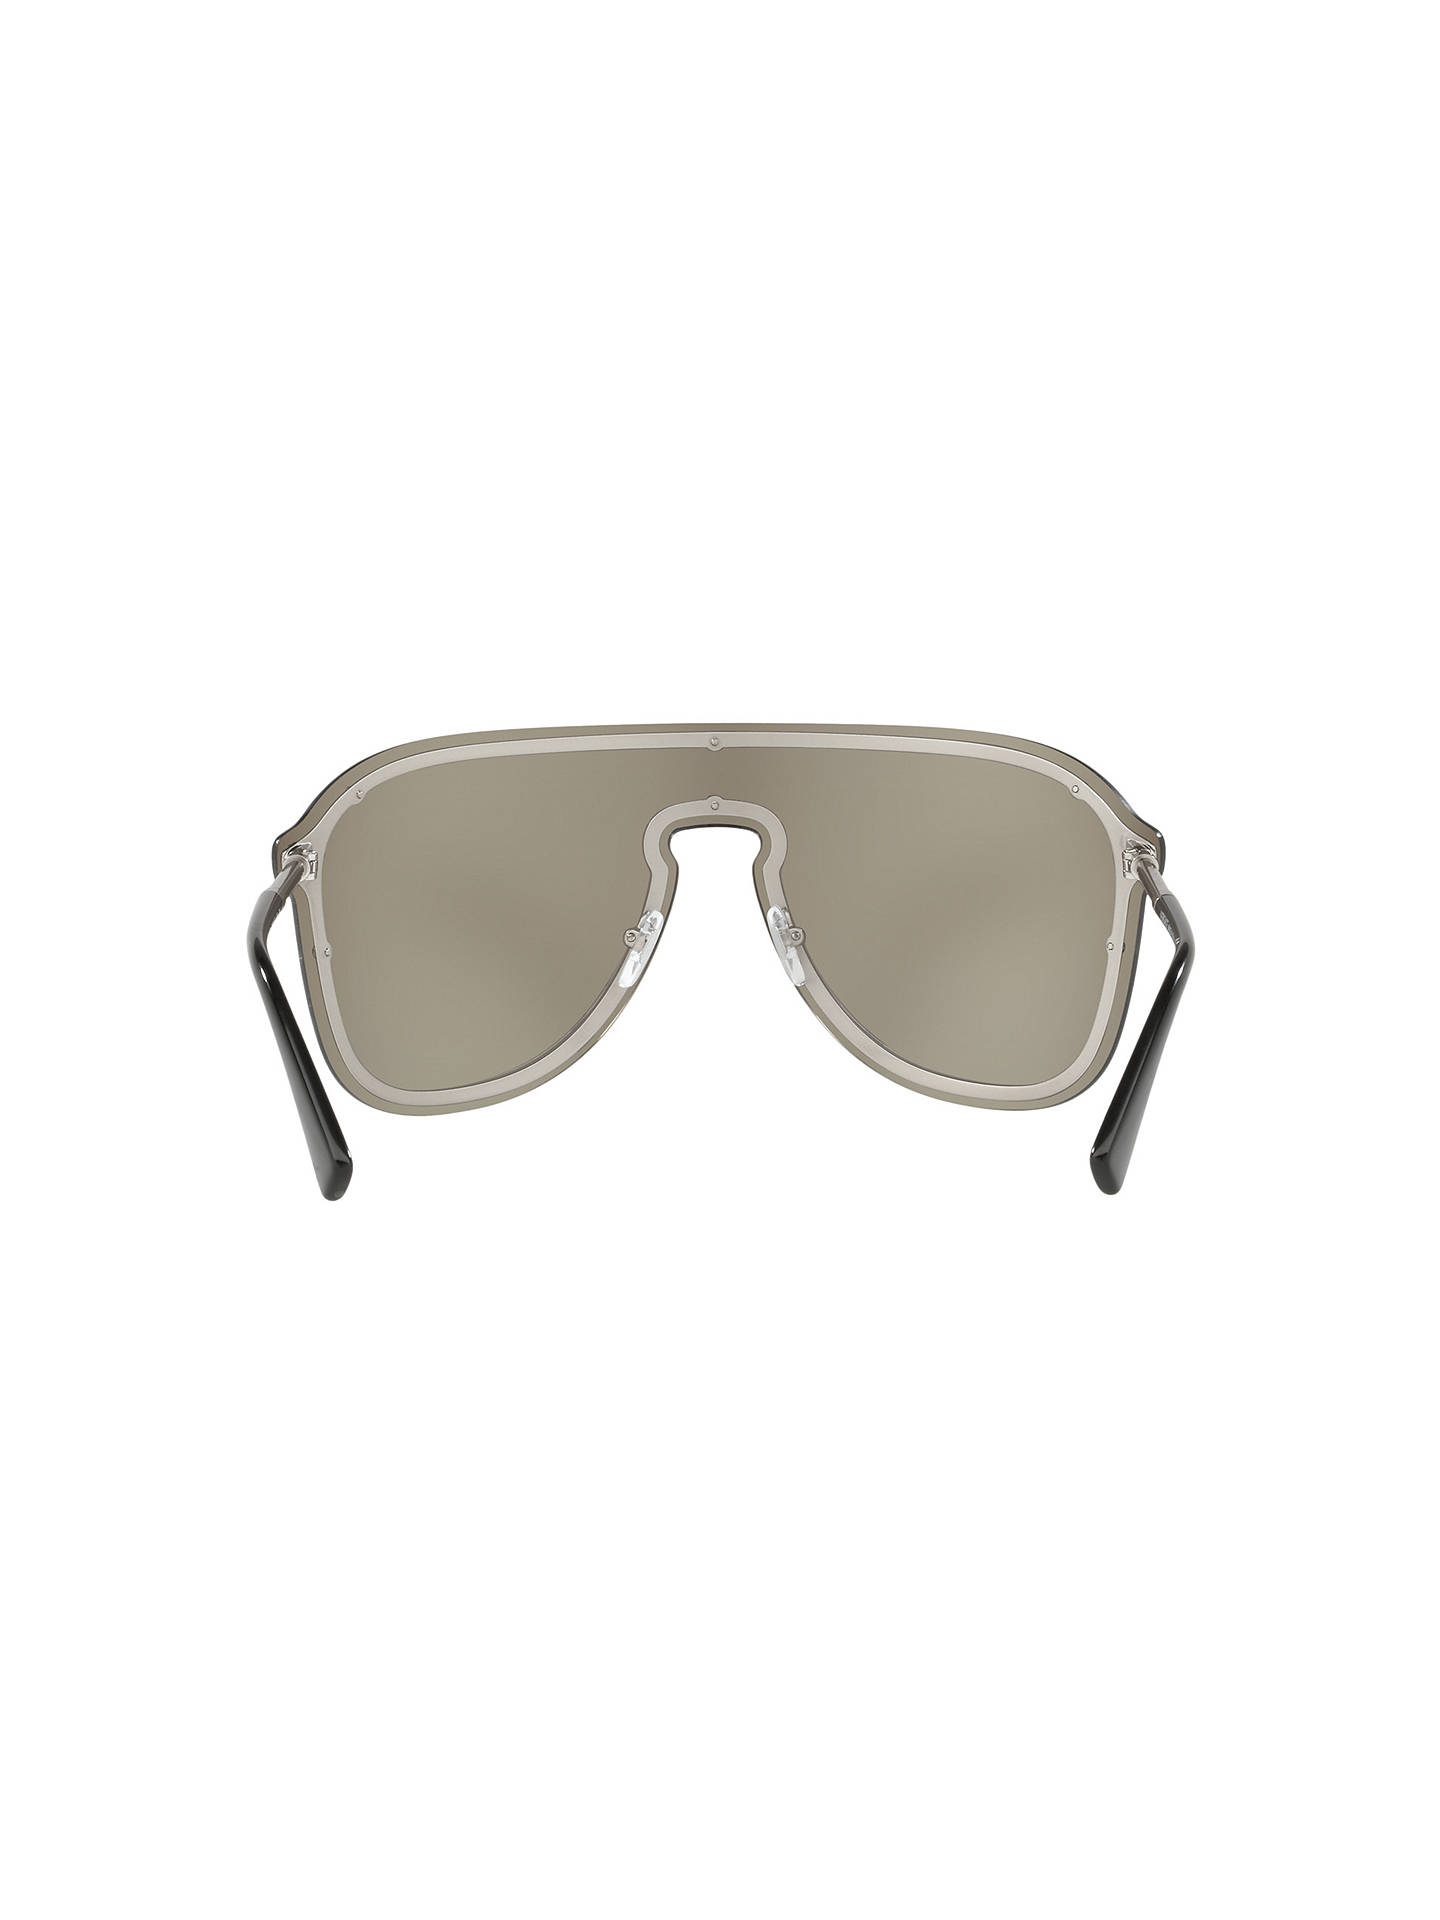 12c4e57833 Versace VE2180 Women s Aviator Sunglasses at John Lewis   Partners